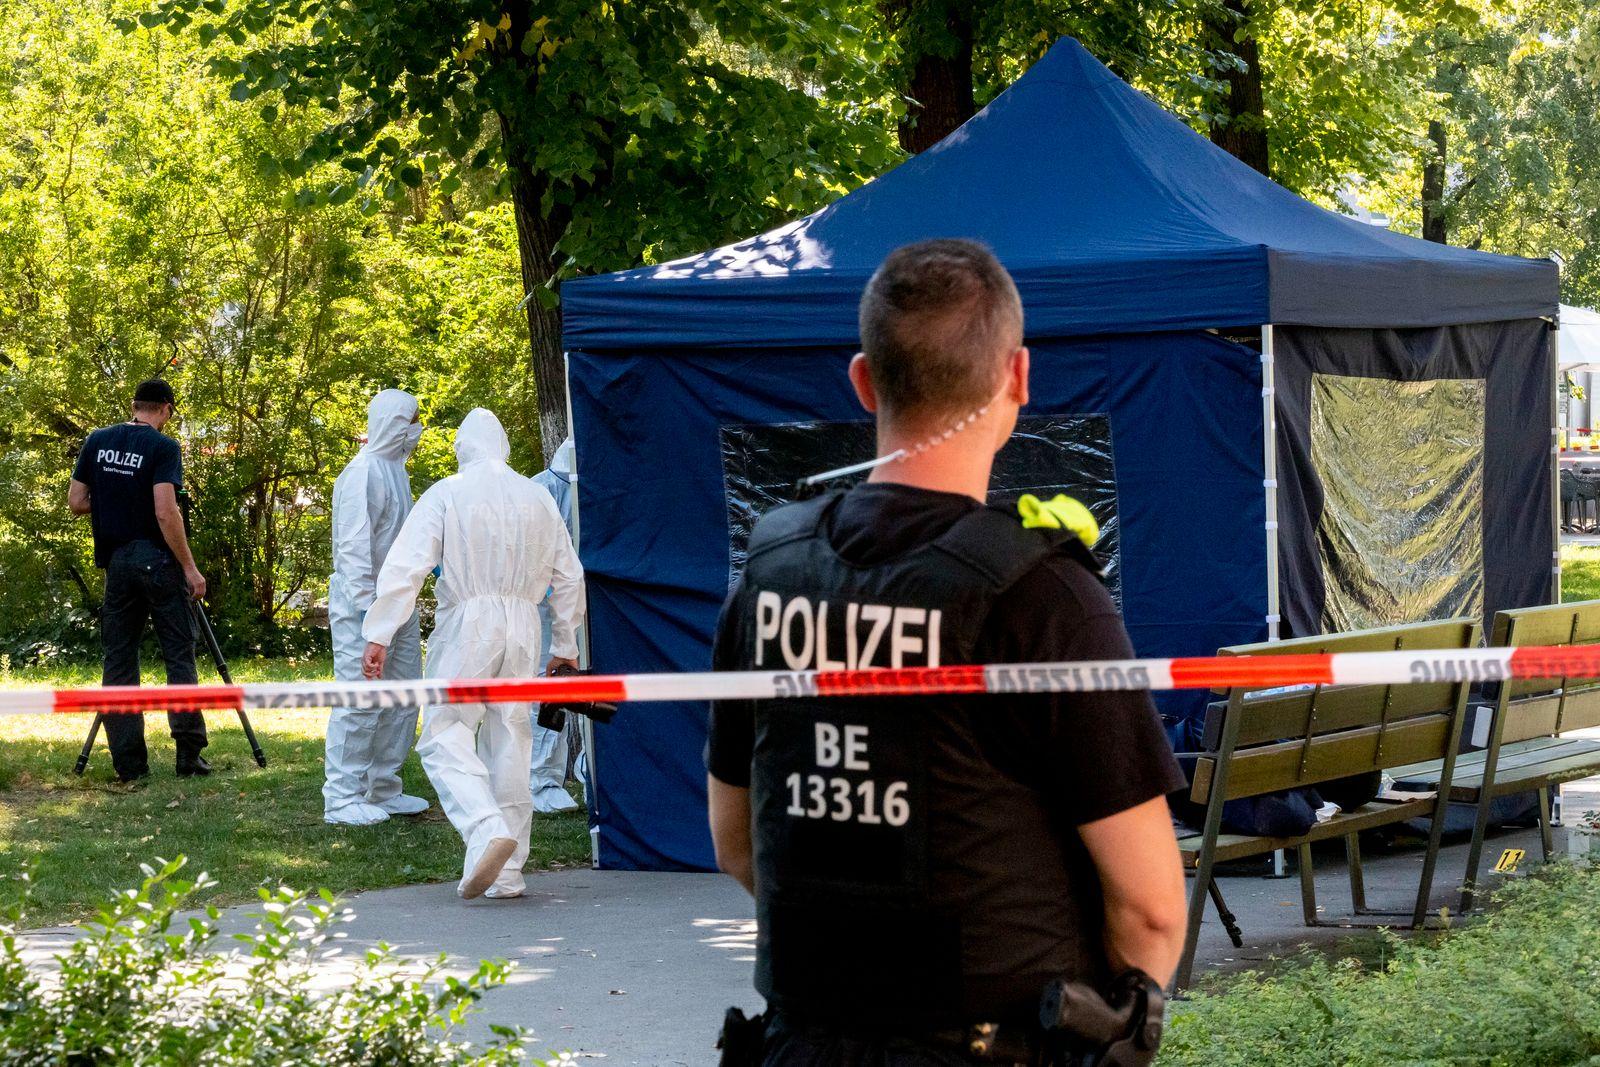 Mord an Georgier - Generalbundesanwalt will eigenen Haftbefehl